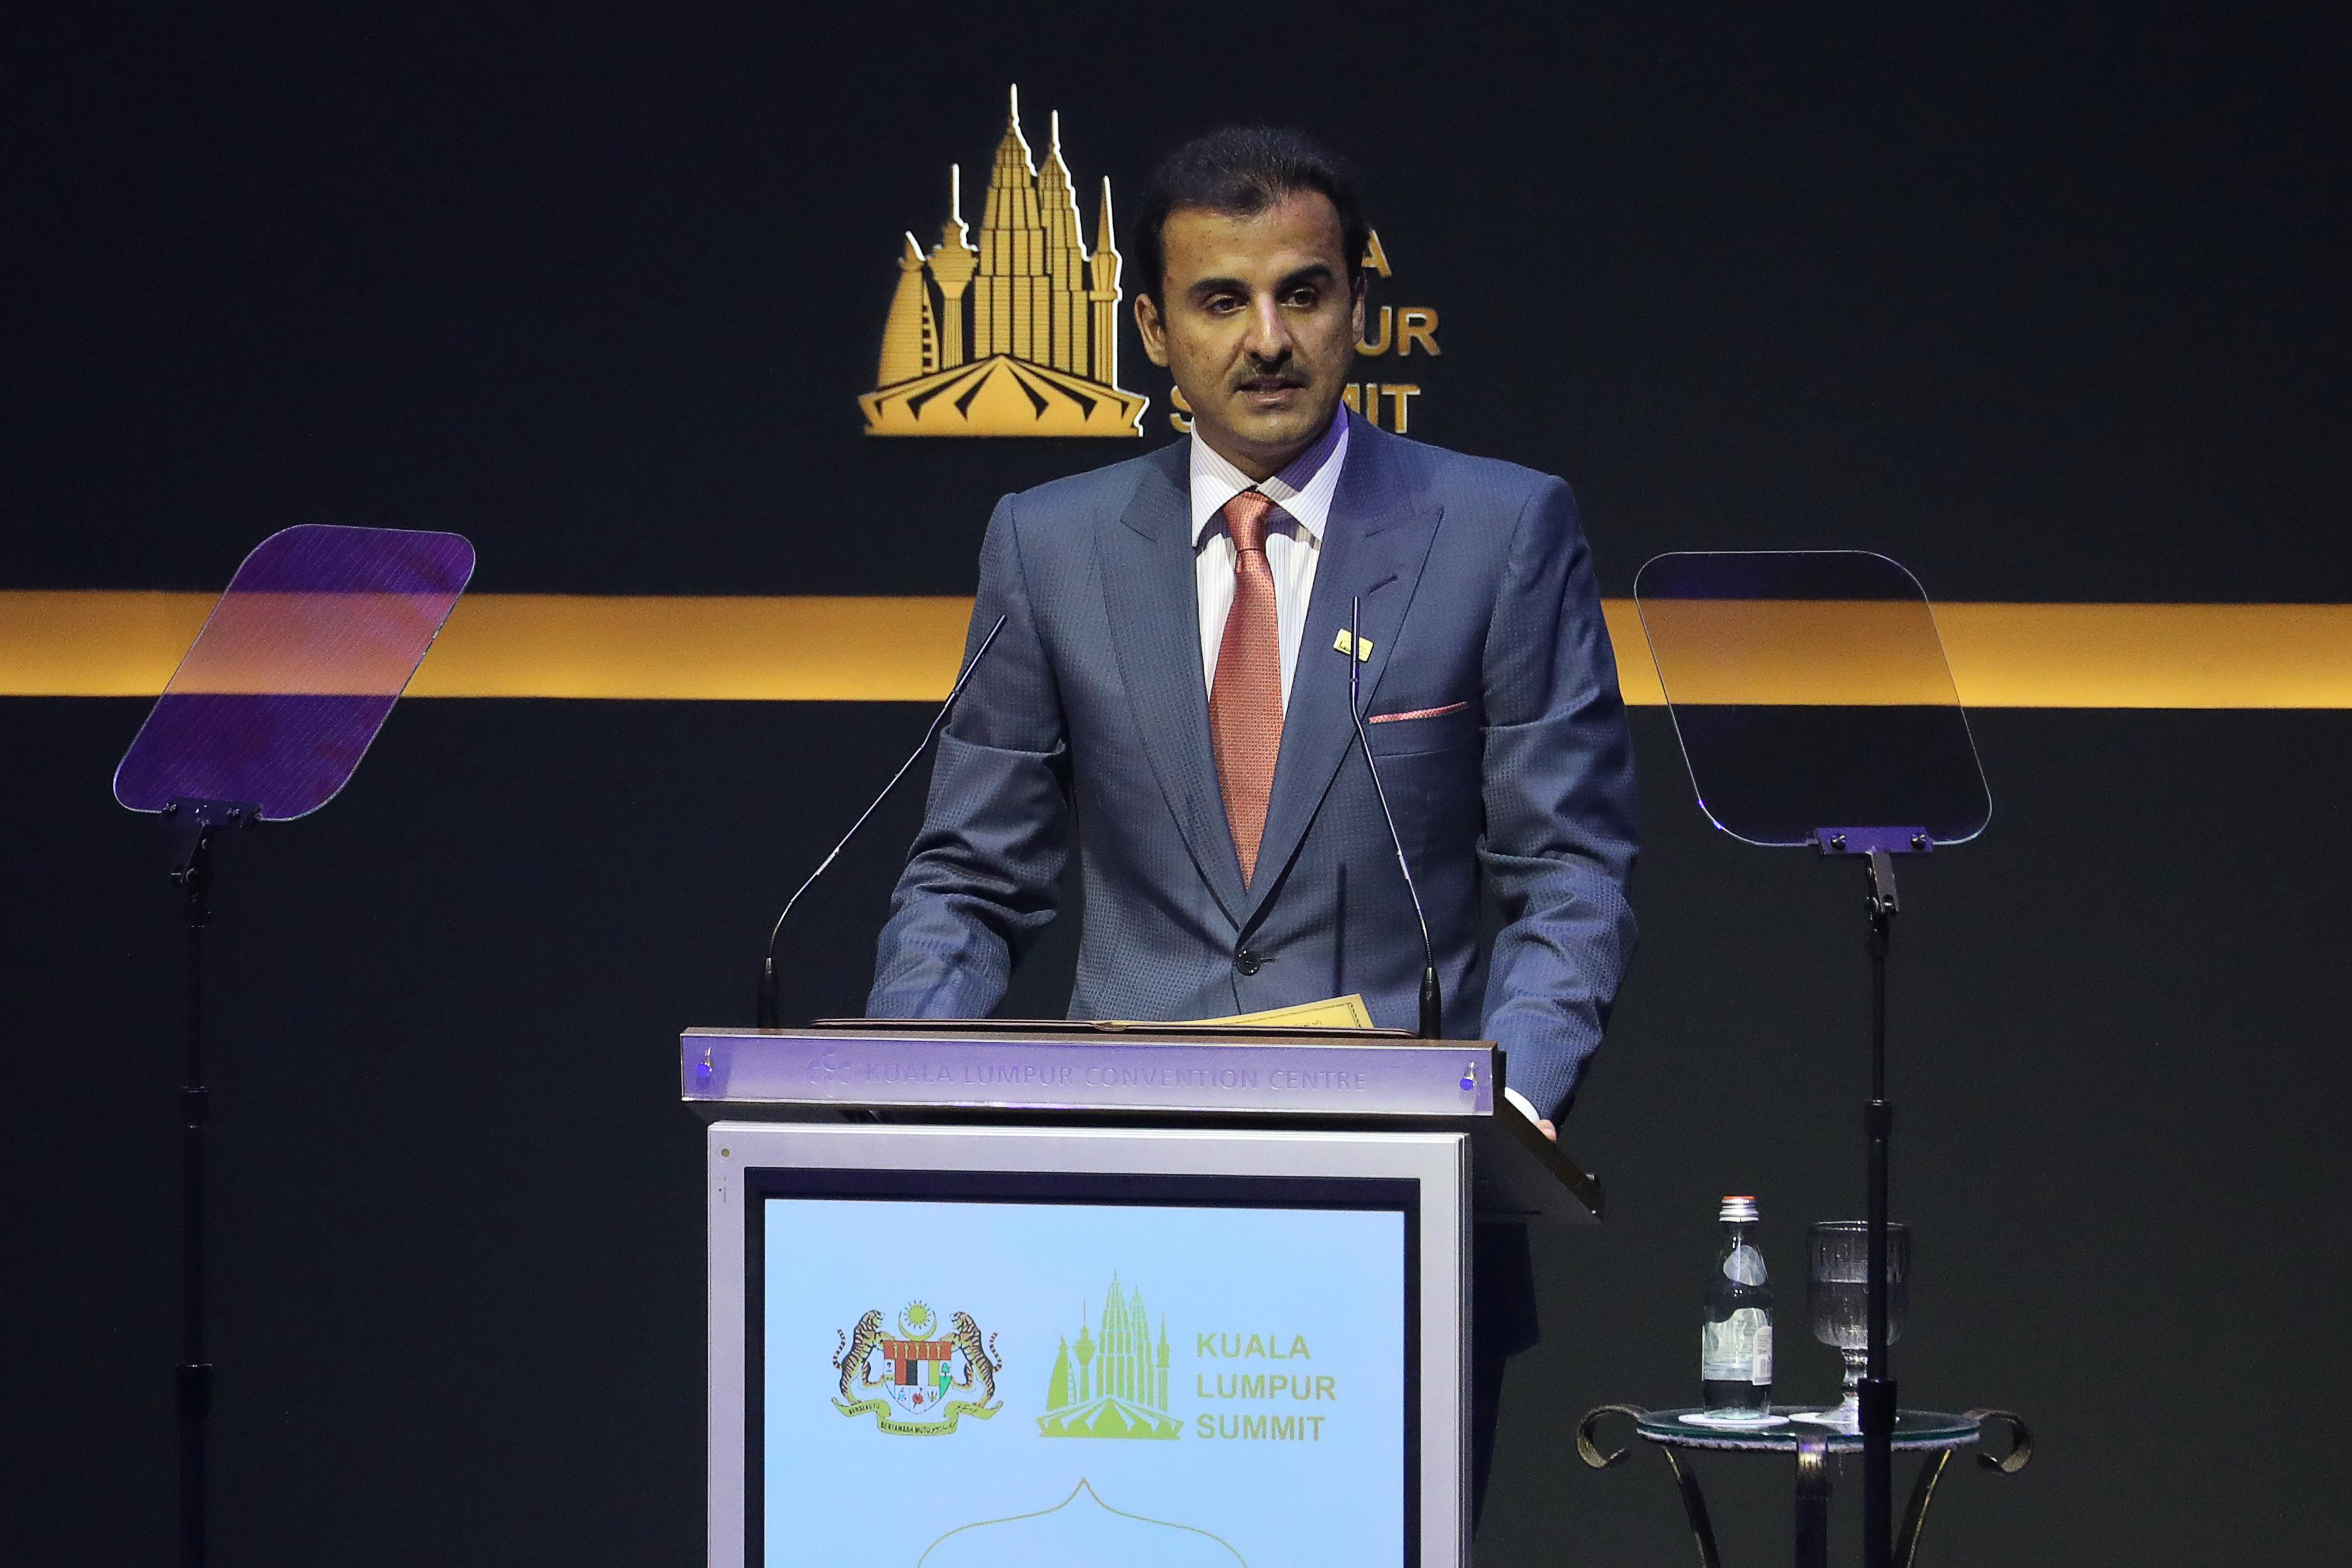 Qatar's Emir Sheikh Tamim bin Hamad Al Thanispeaks during Kuala Lumpur Summit in Kuala Lumpur, Malaysia, December 19, 2019. REUTERS/Lim Huey Teng